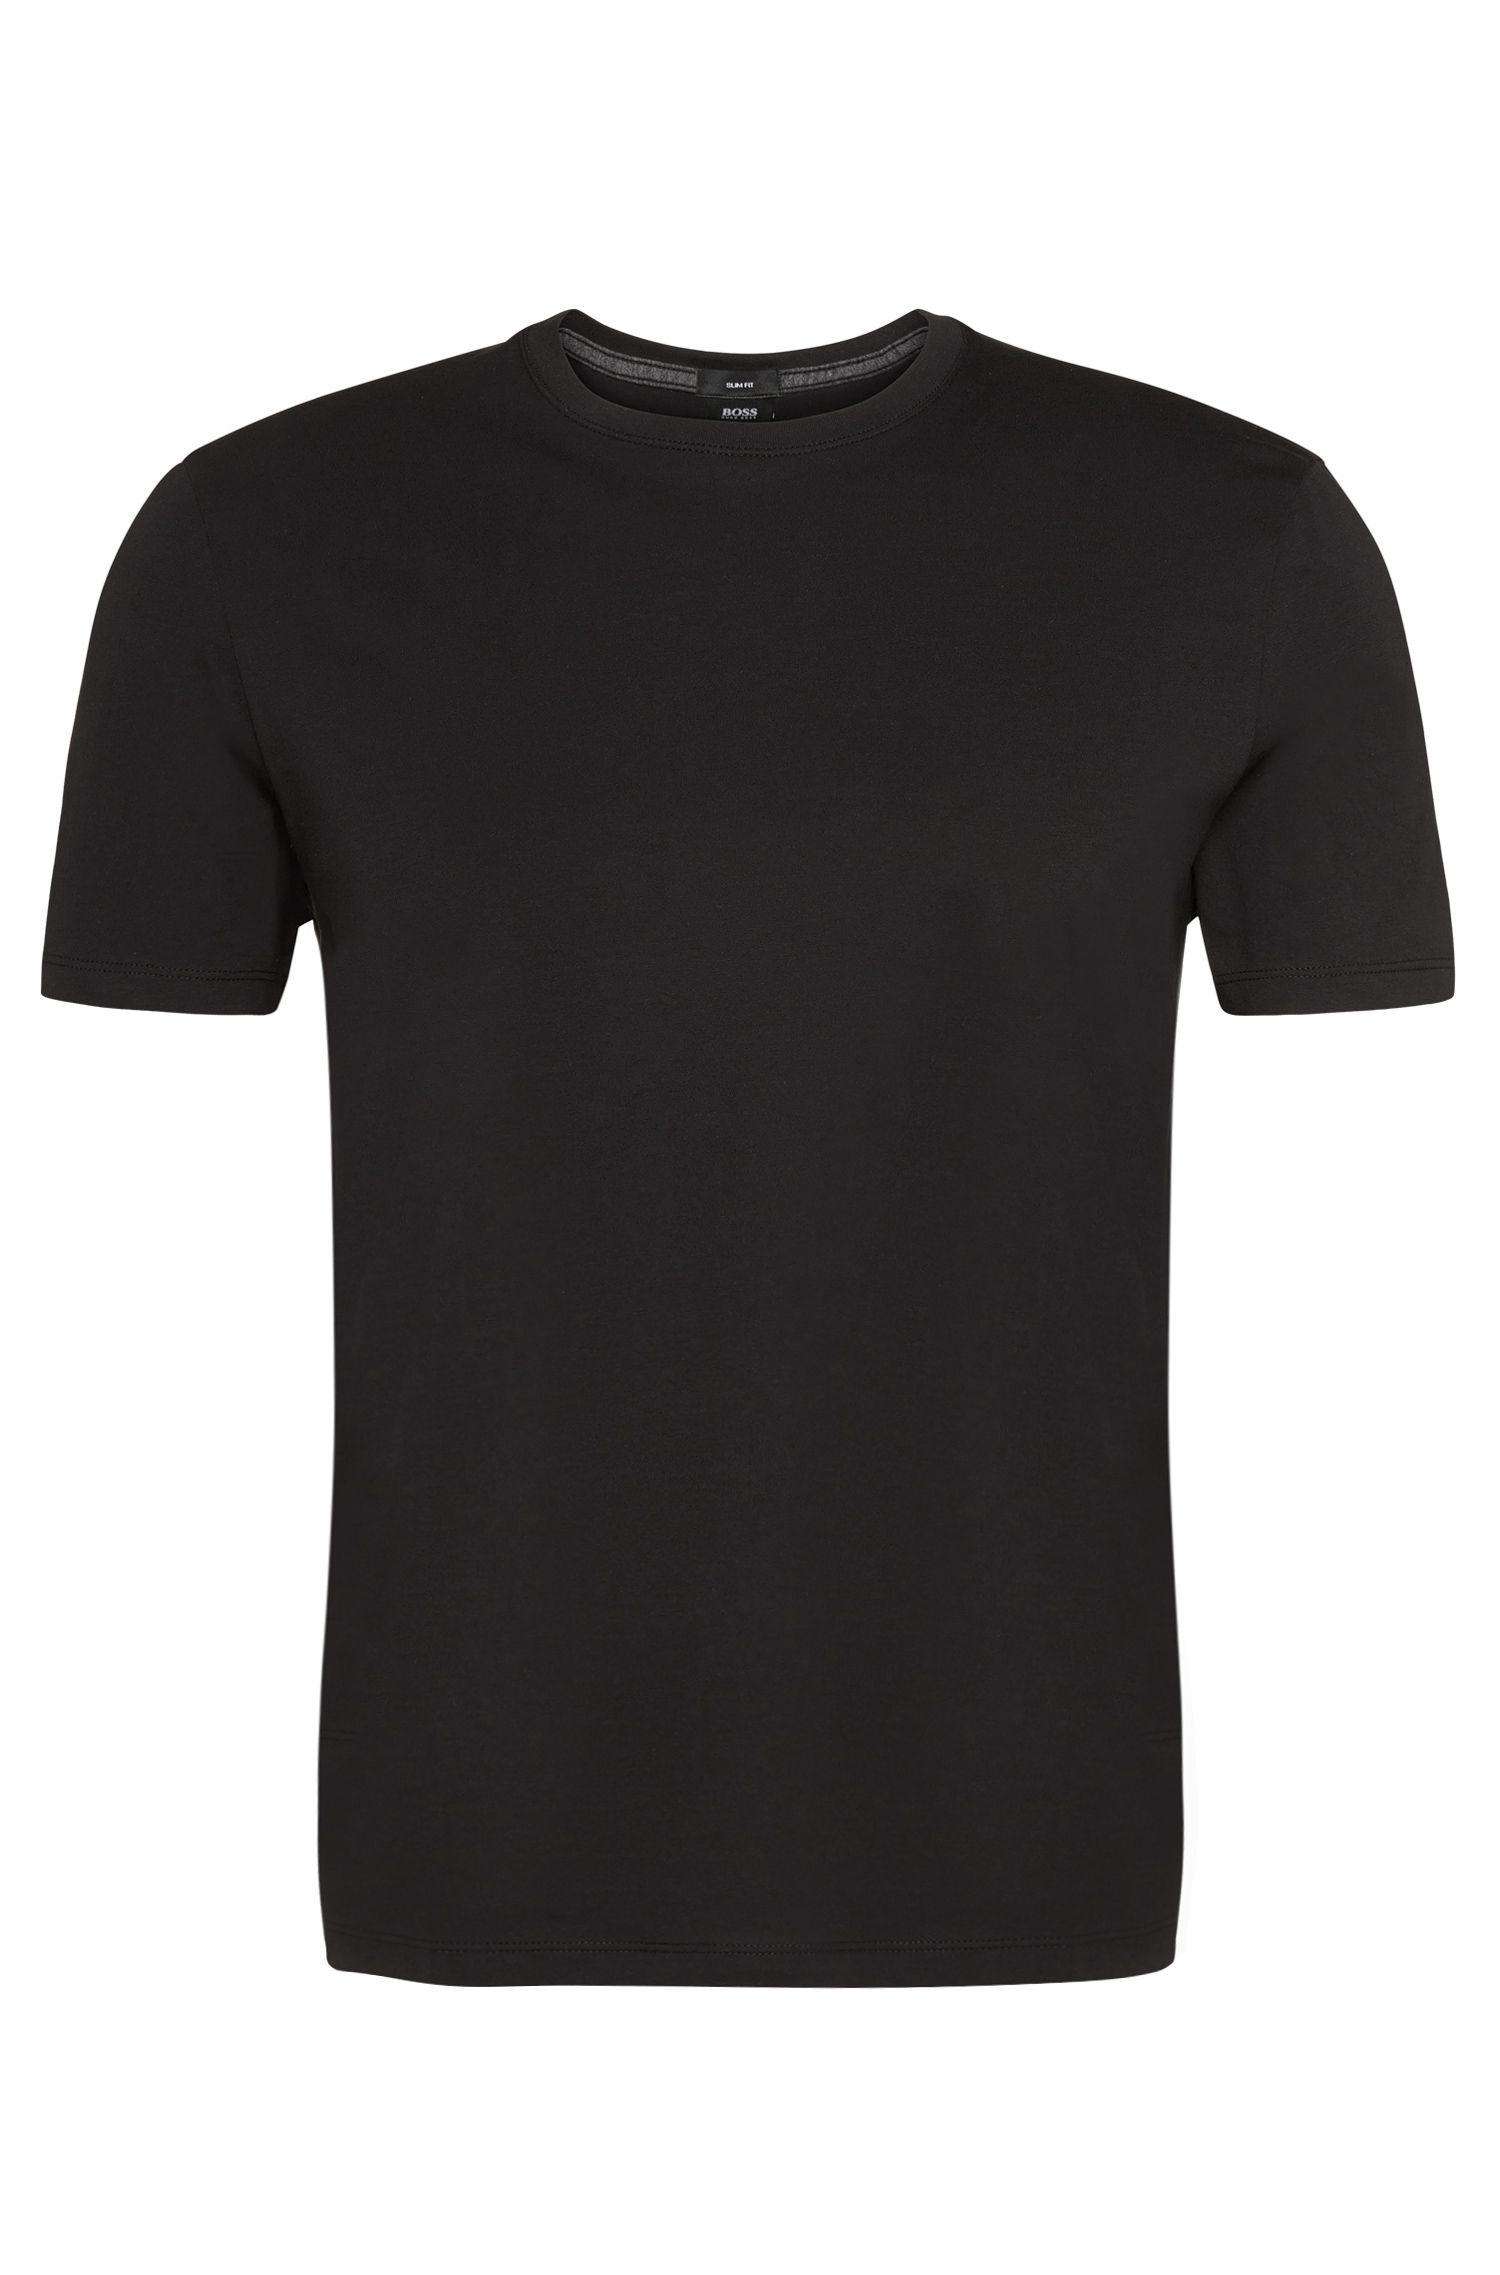 Slim-fit t-shirt in cotton: 'Tessler 09'